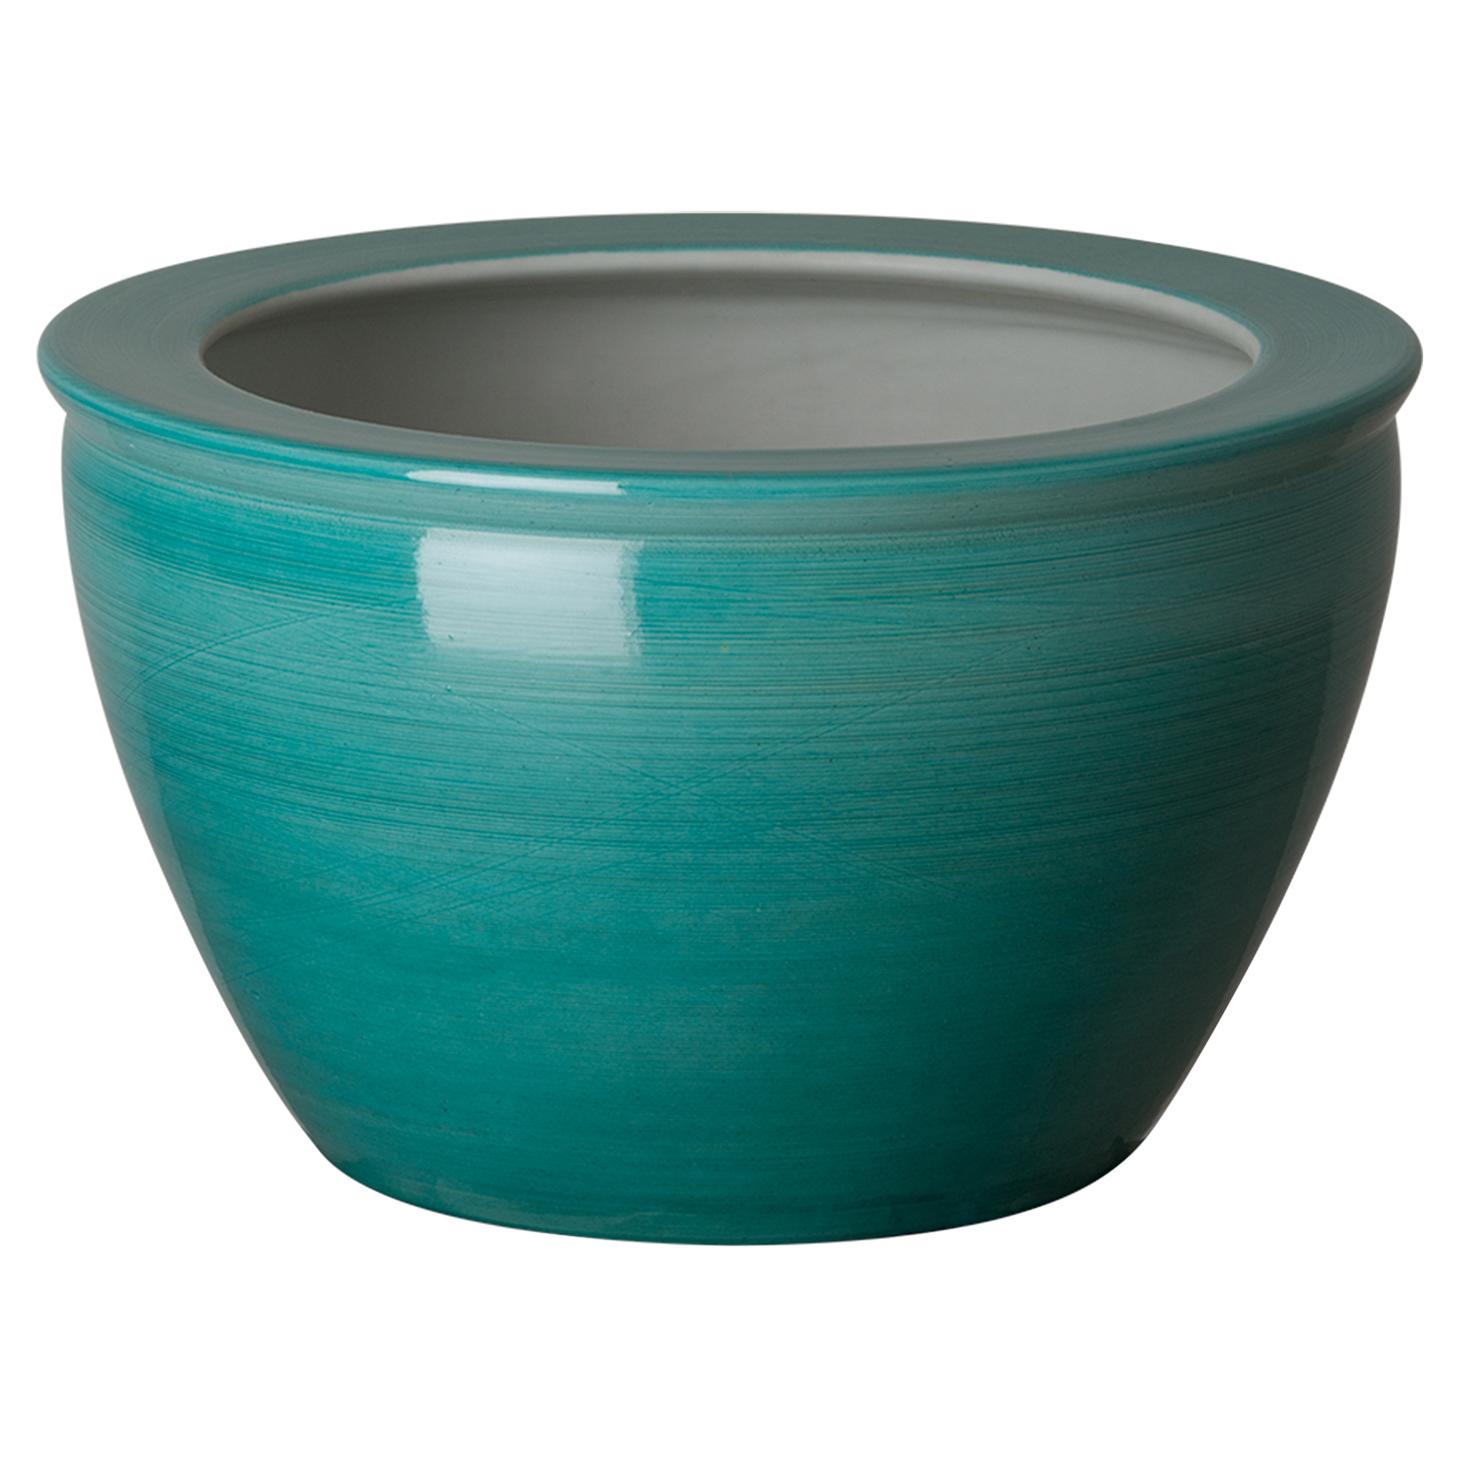 Calma Coastal Peacock Blue Linear Round Ceramic Planter